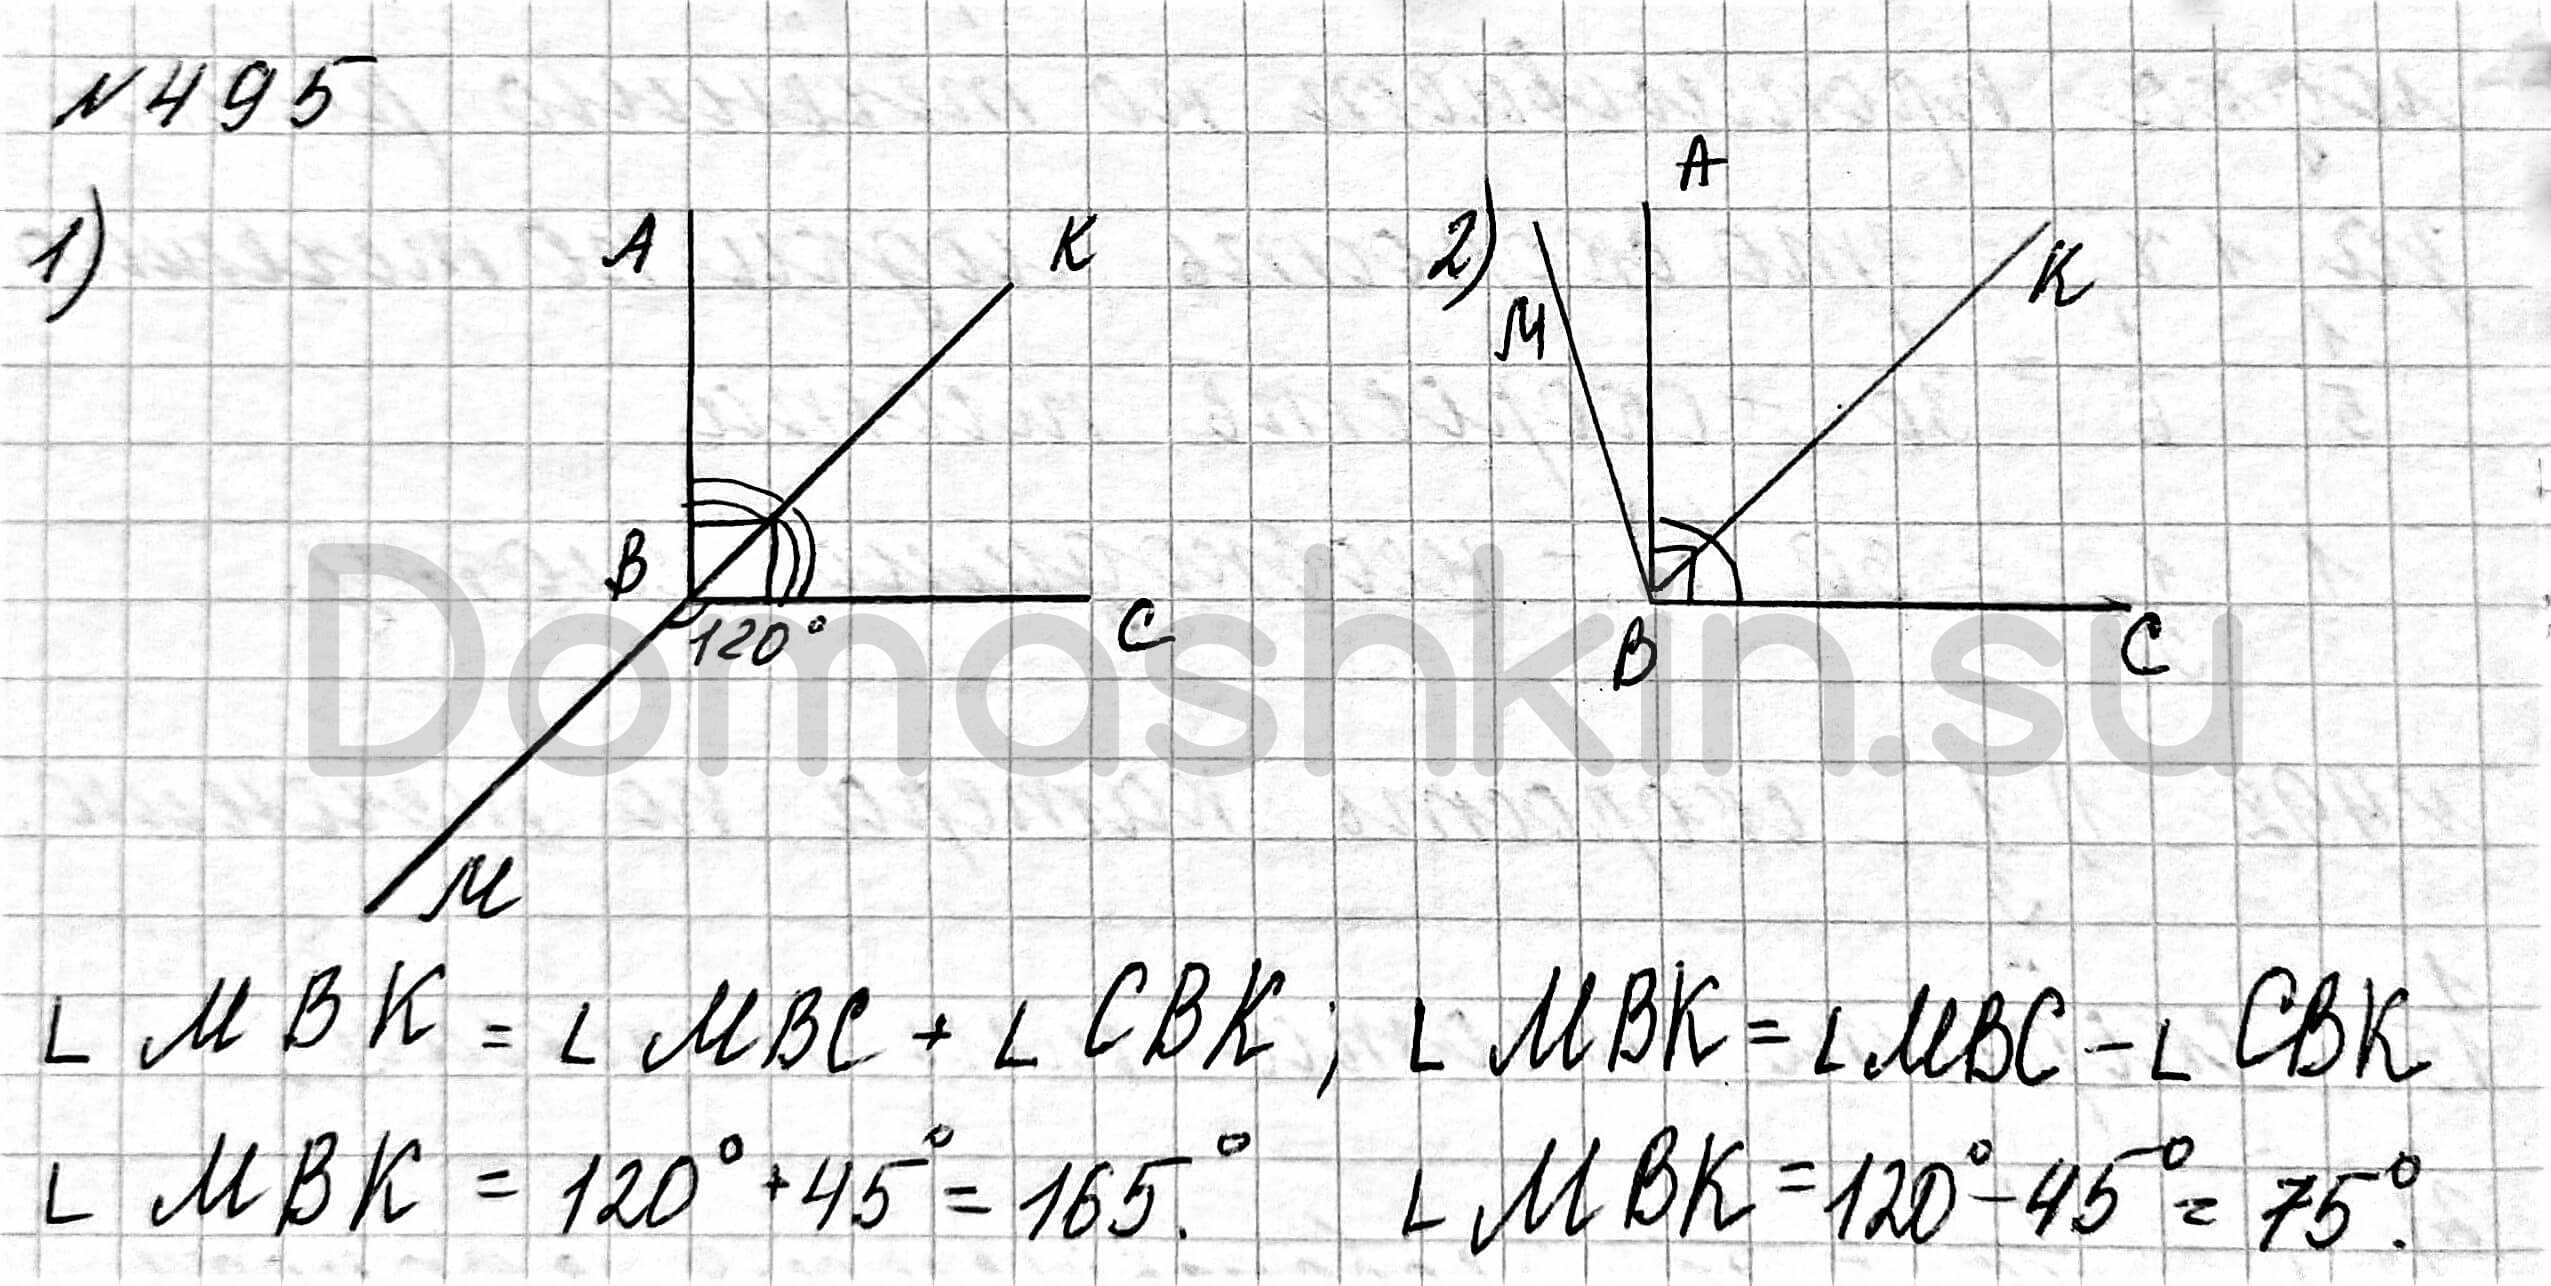 Математика 6 класс учебник Мерзляк номер 495 решение